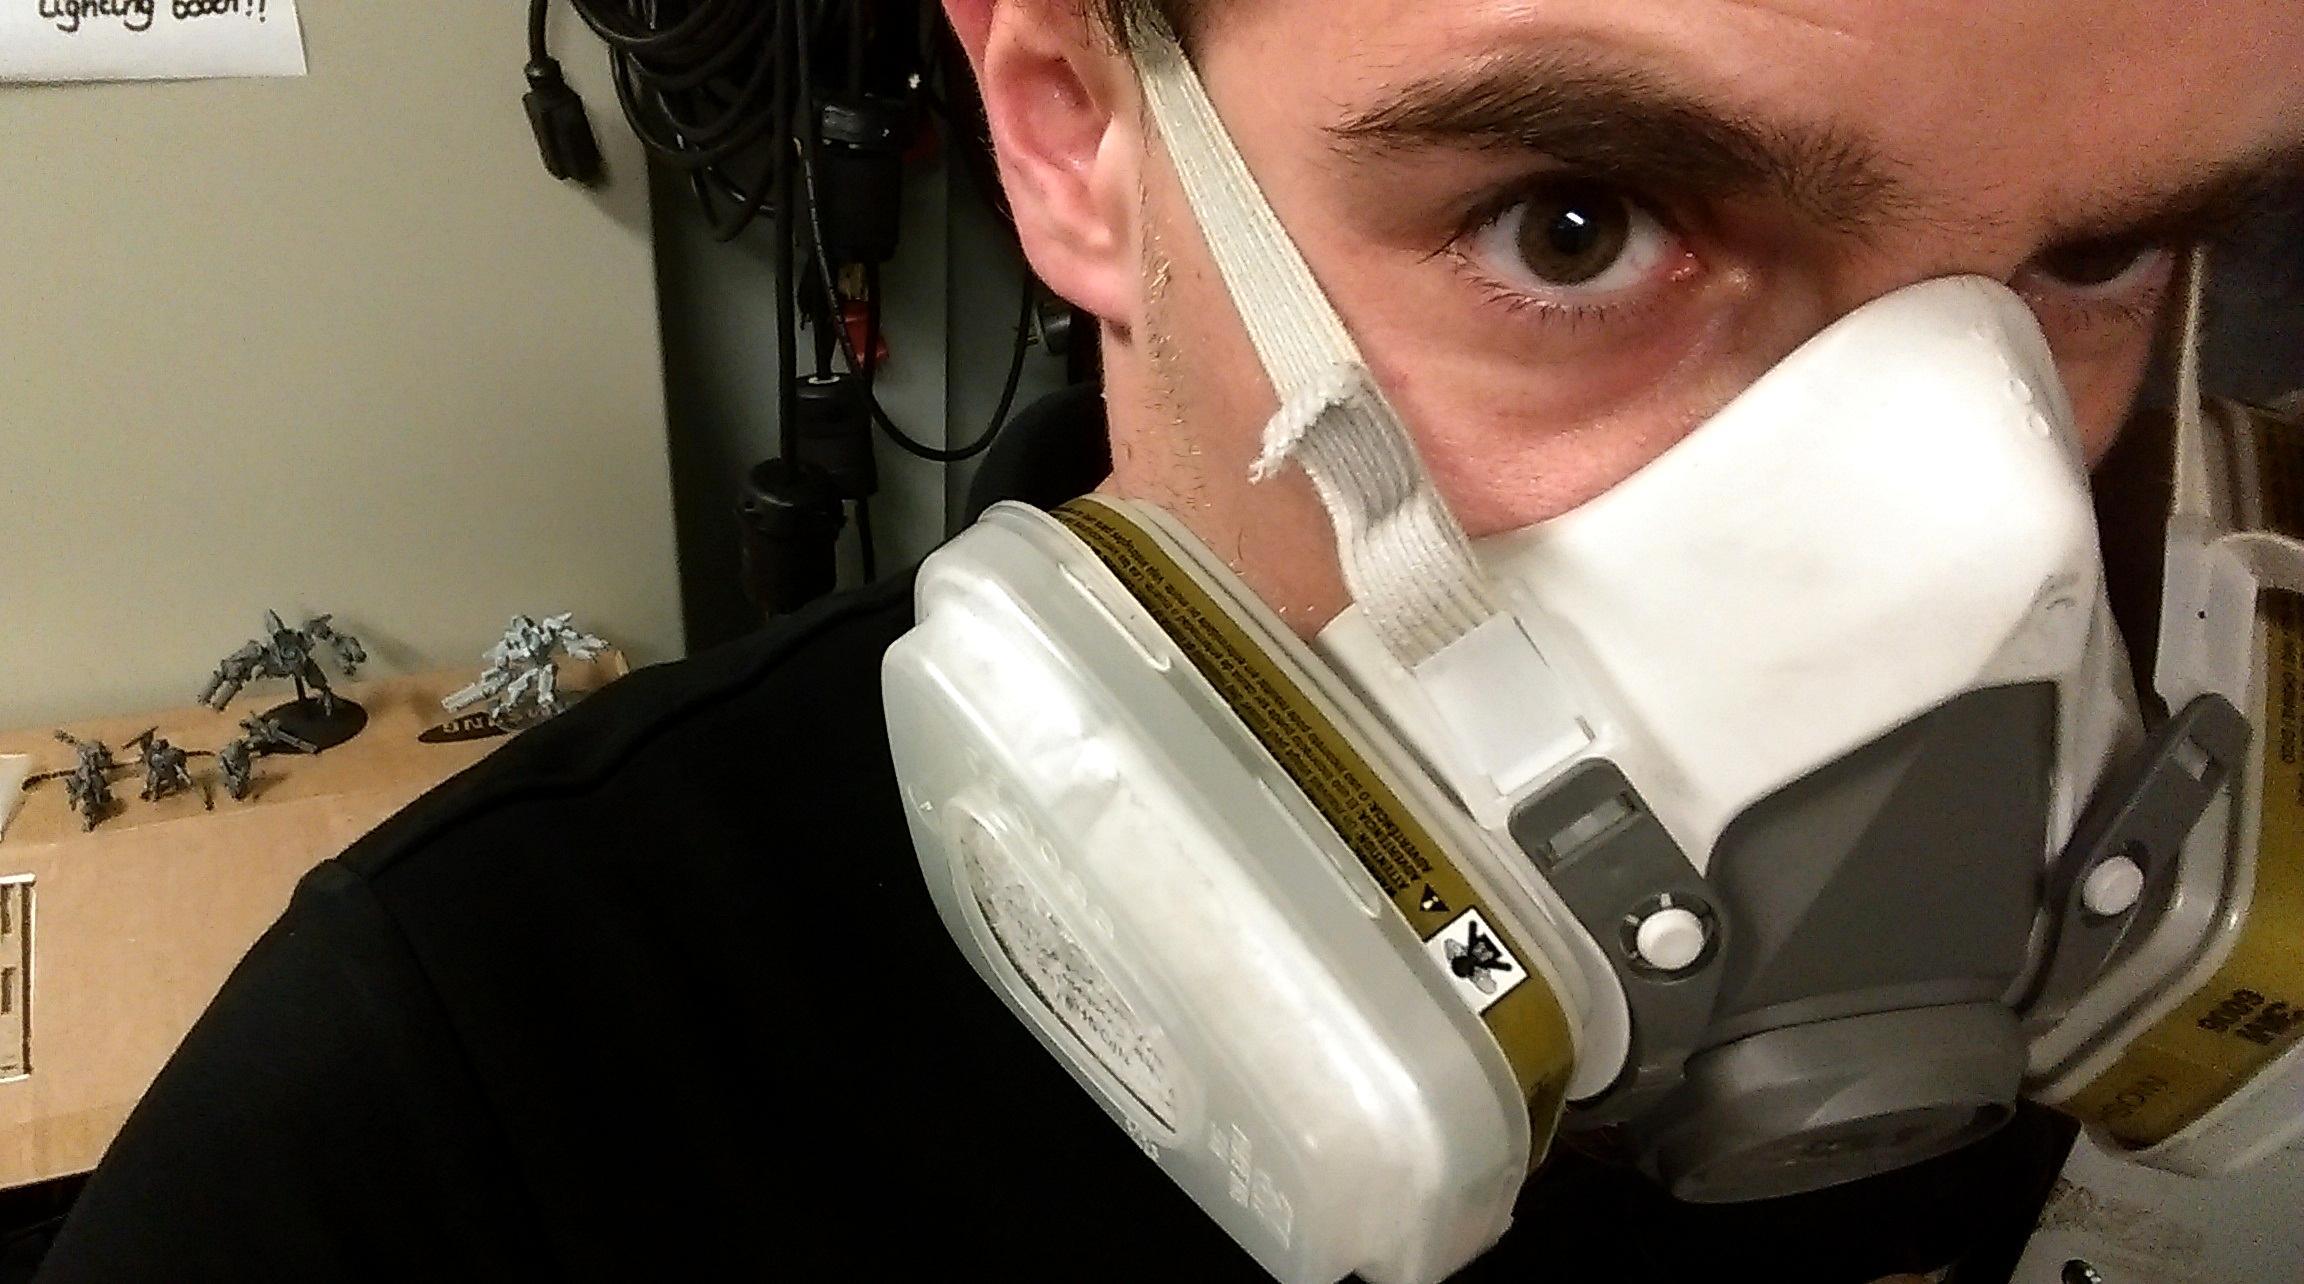 Painting, Remove, Respirator